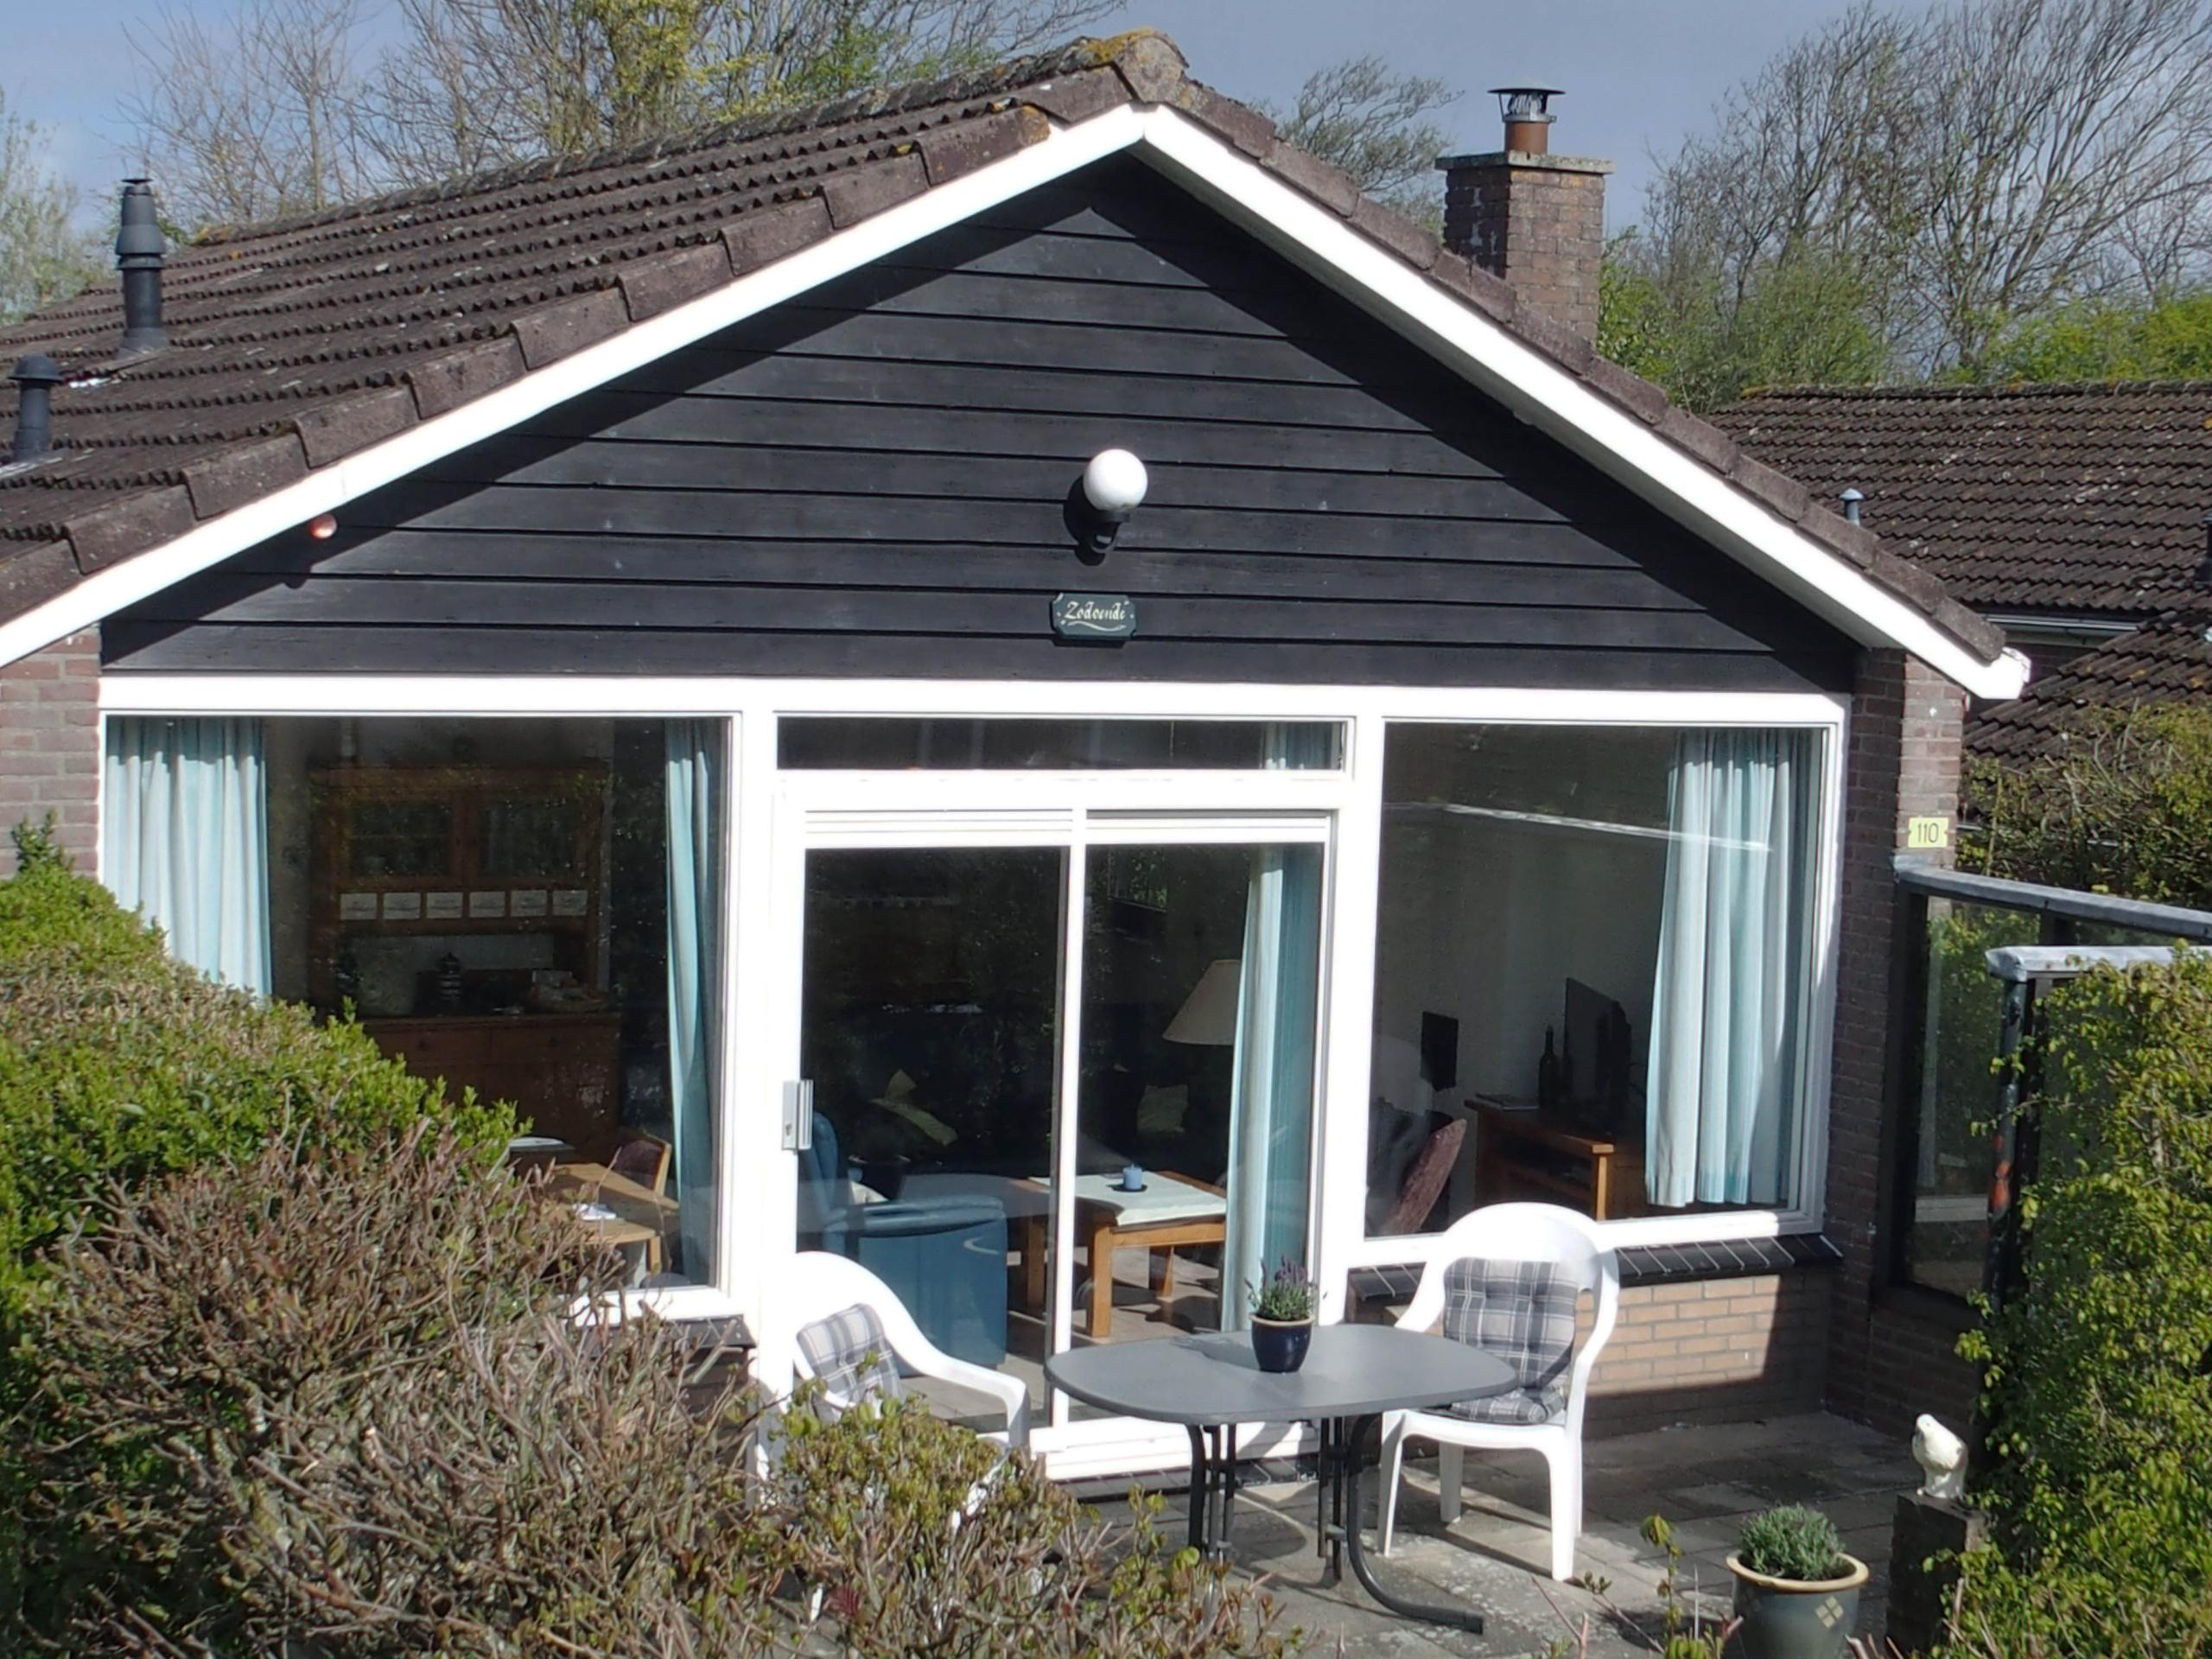 Holiday bungalow in a wonderful location at De Slufter